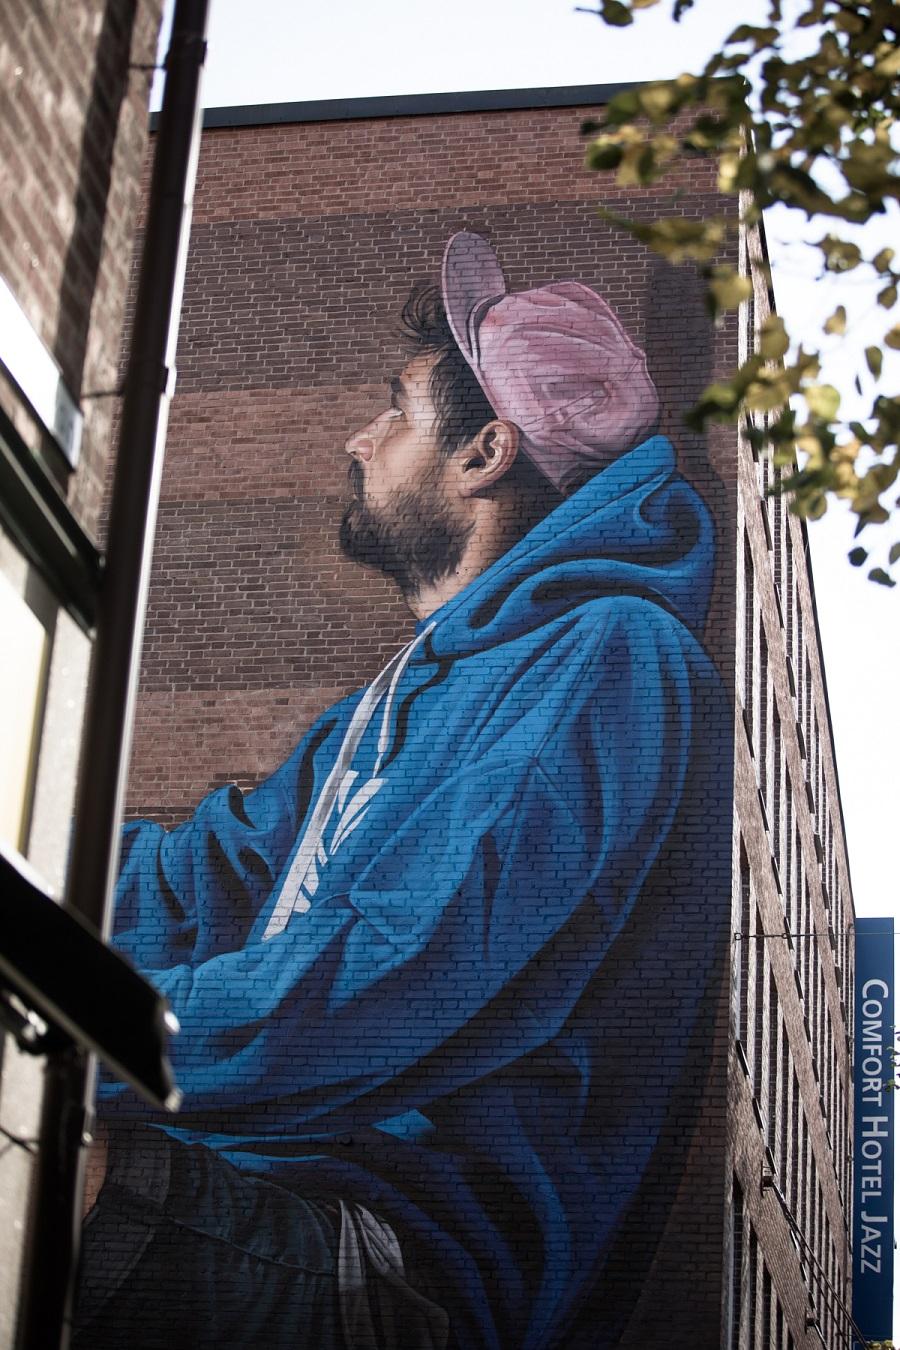 West Sweden, Street Art in Boras, ©Robert Dahlburg